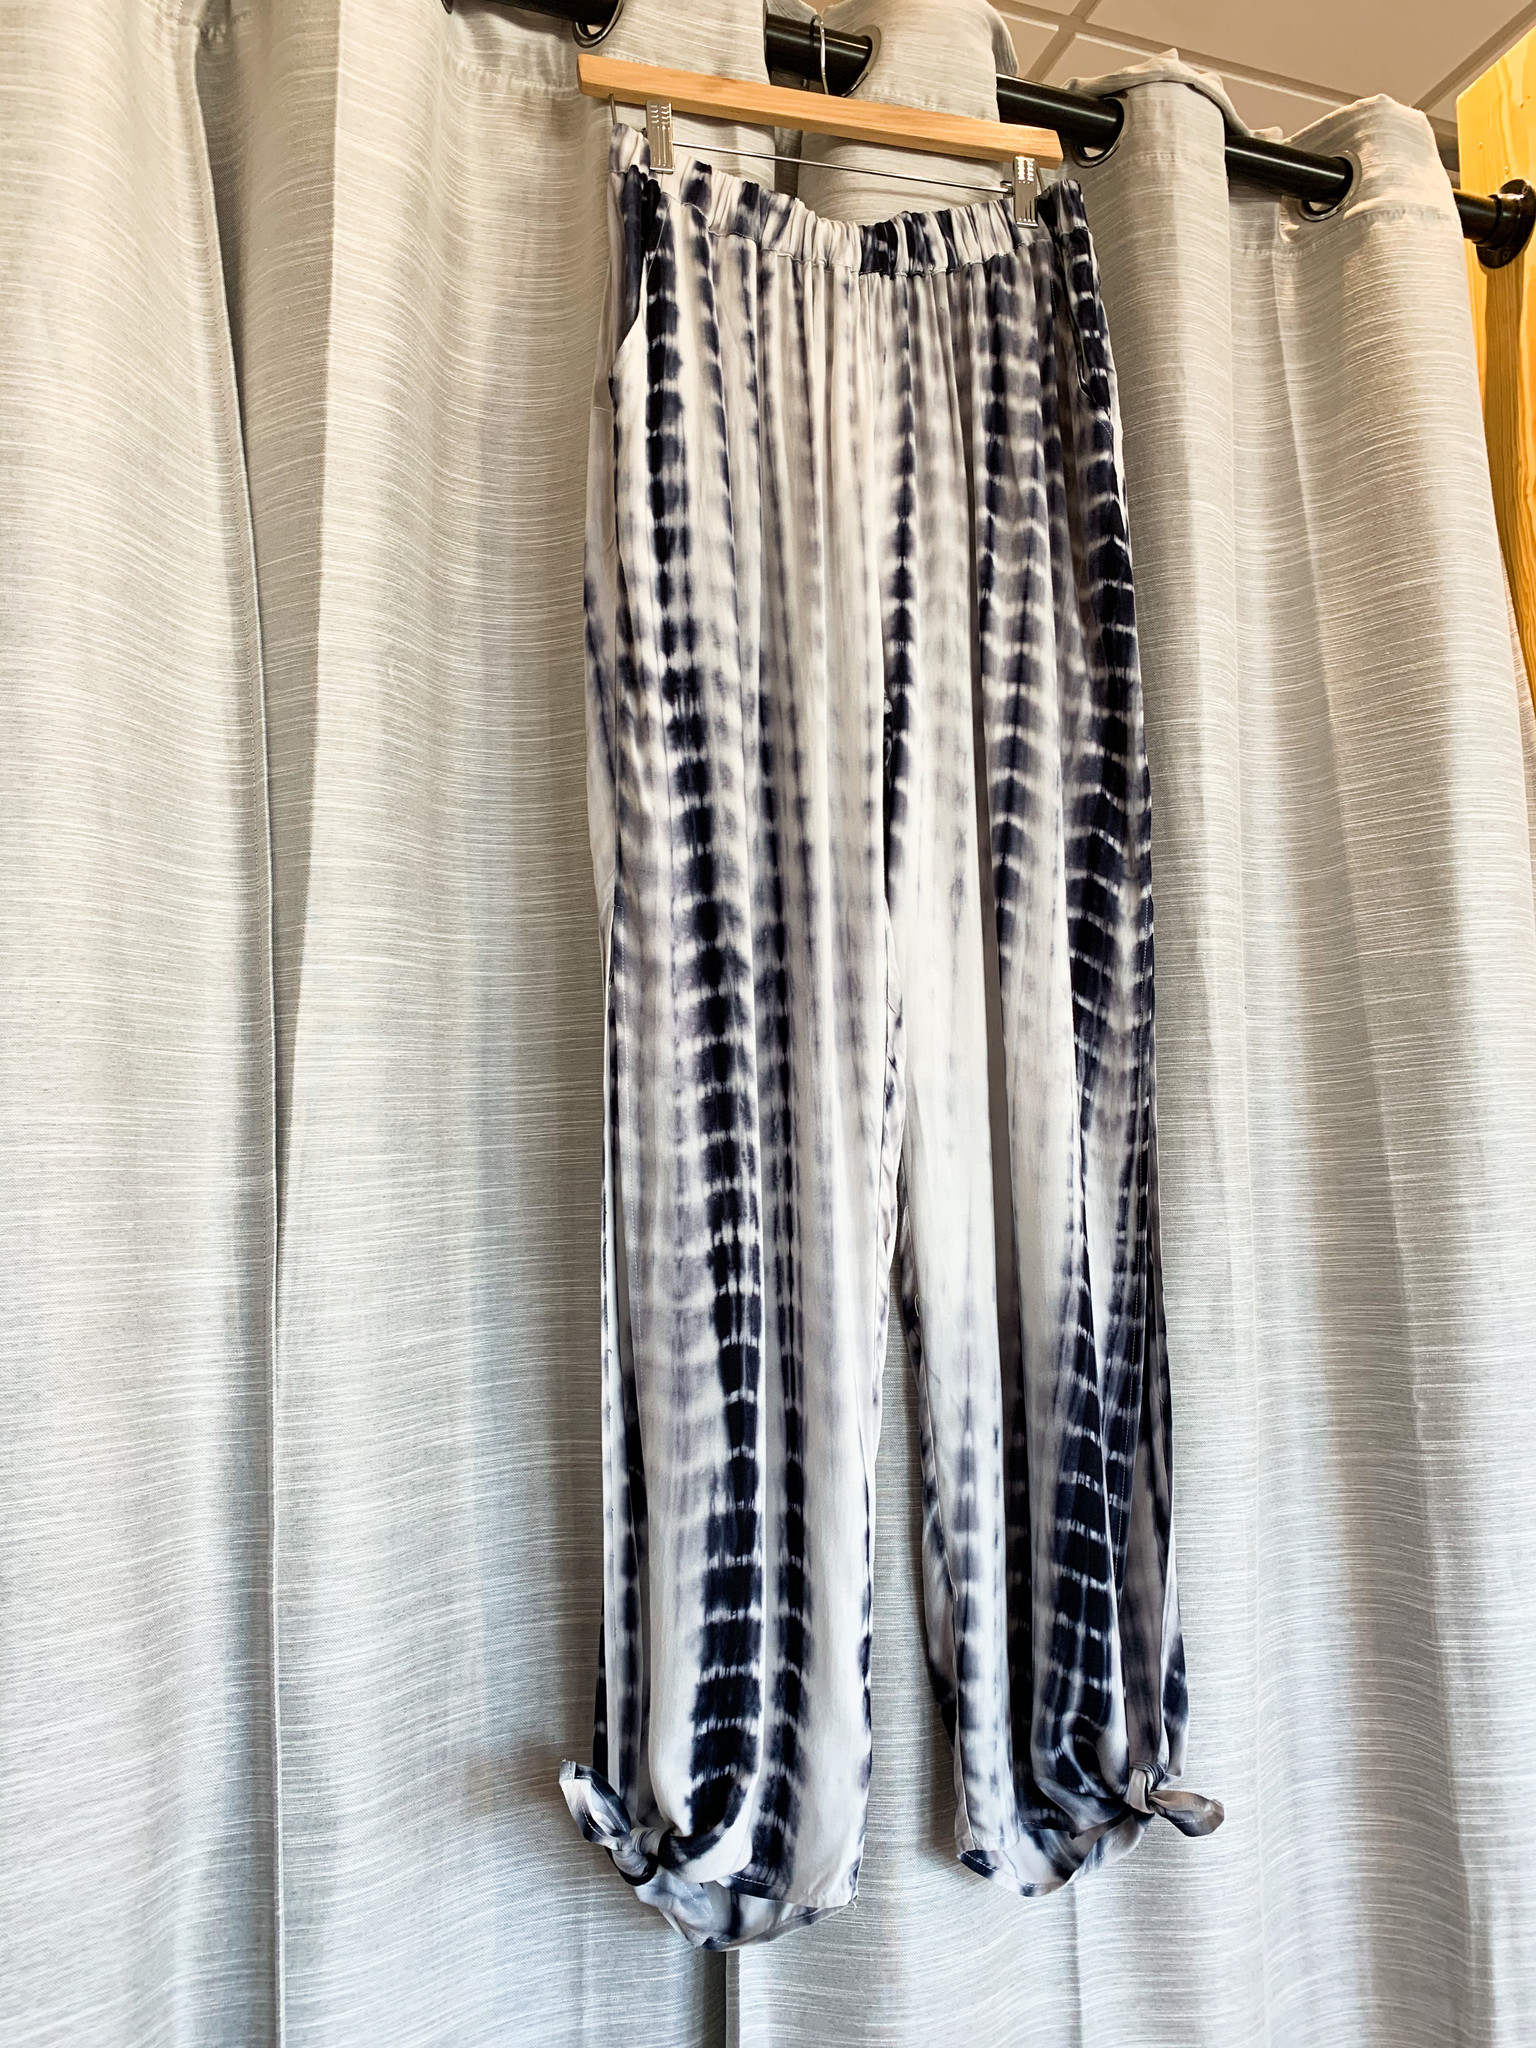 Black/Charcoal Tie Dye Elastic Waist Bottom Tie Pants